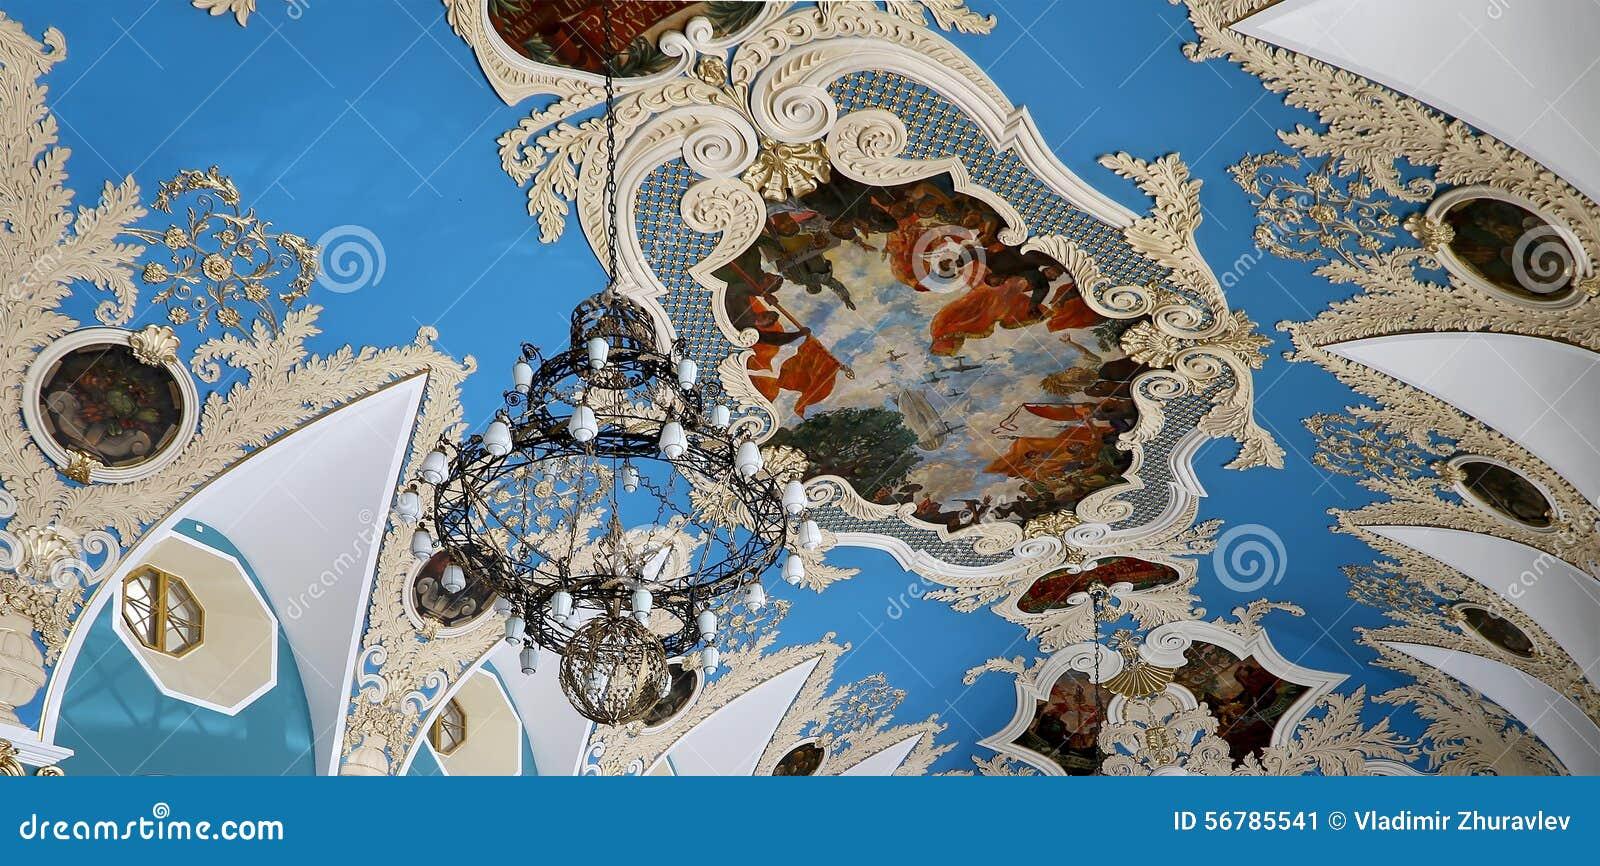 VIP-αίθουσα ή ένας υψηλότερος σταθμός Kazansky άνεσης δωματίων σιδηροδρομικός (Kazansky vokzal)--είναι ένα από εννέα τερματικά σι